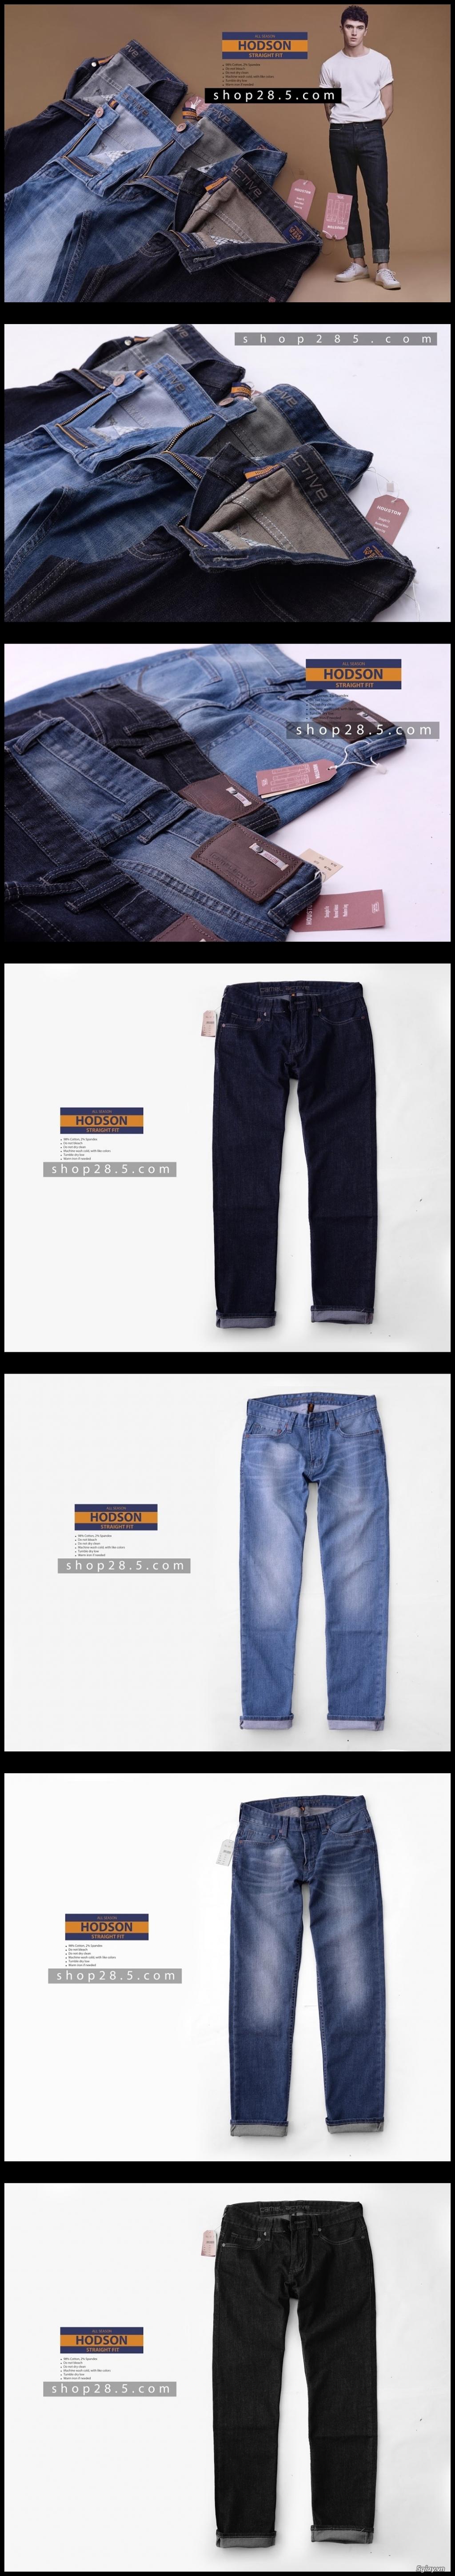 Shop285.com - Shop quần áo : Zara,Jules,Jake*s,,Hollister,Aber,CK,Tommy,Levis - 32